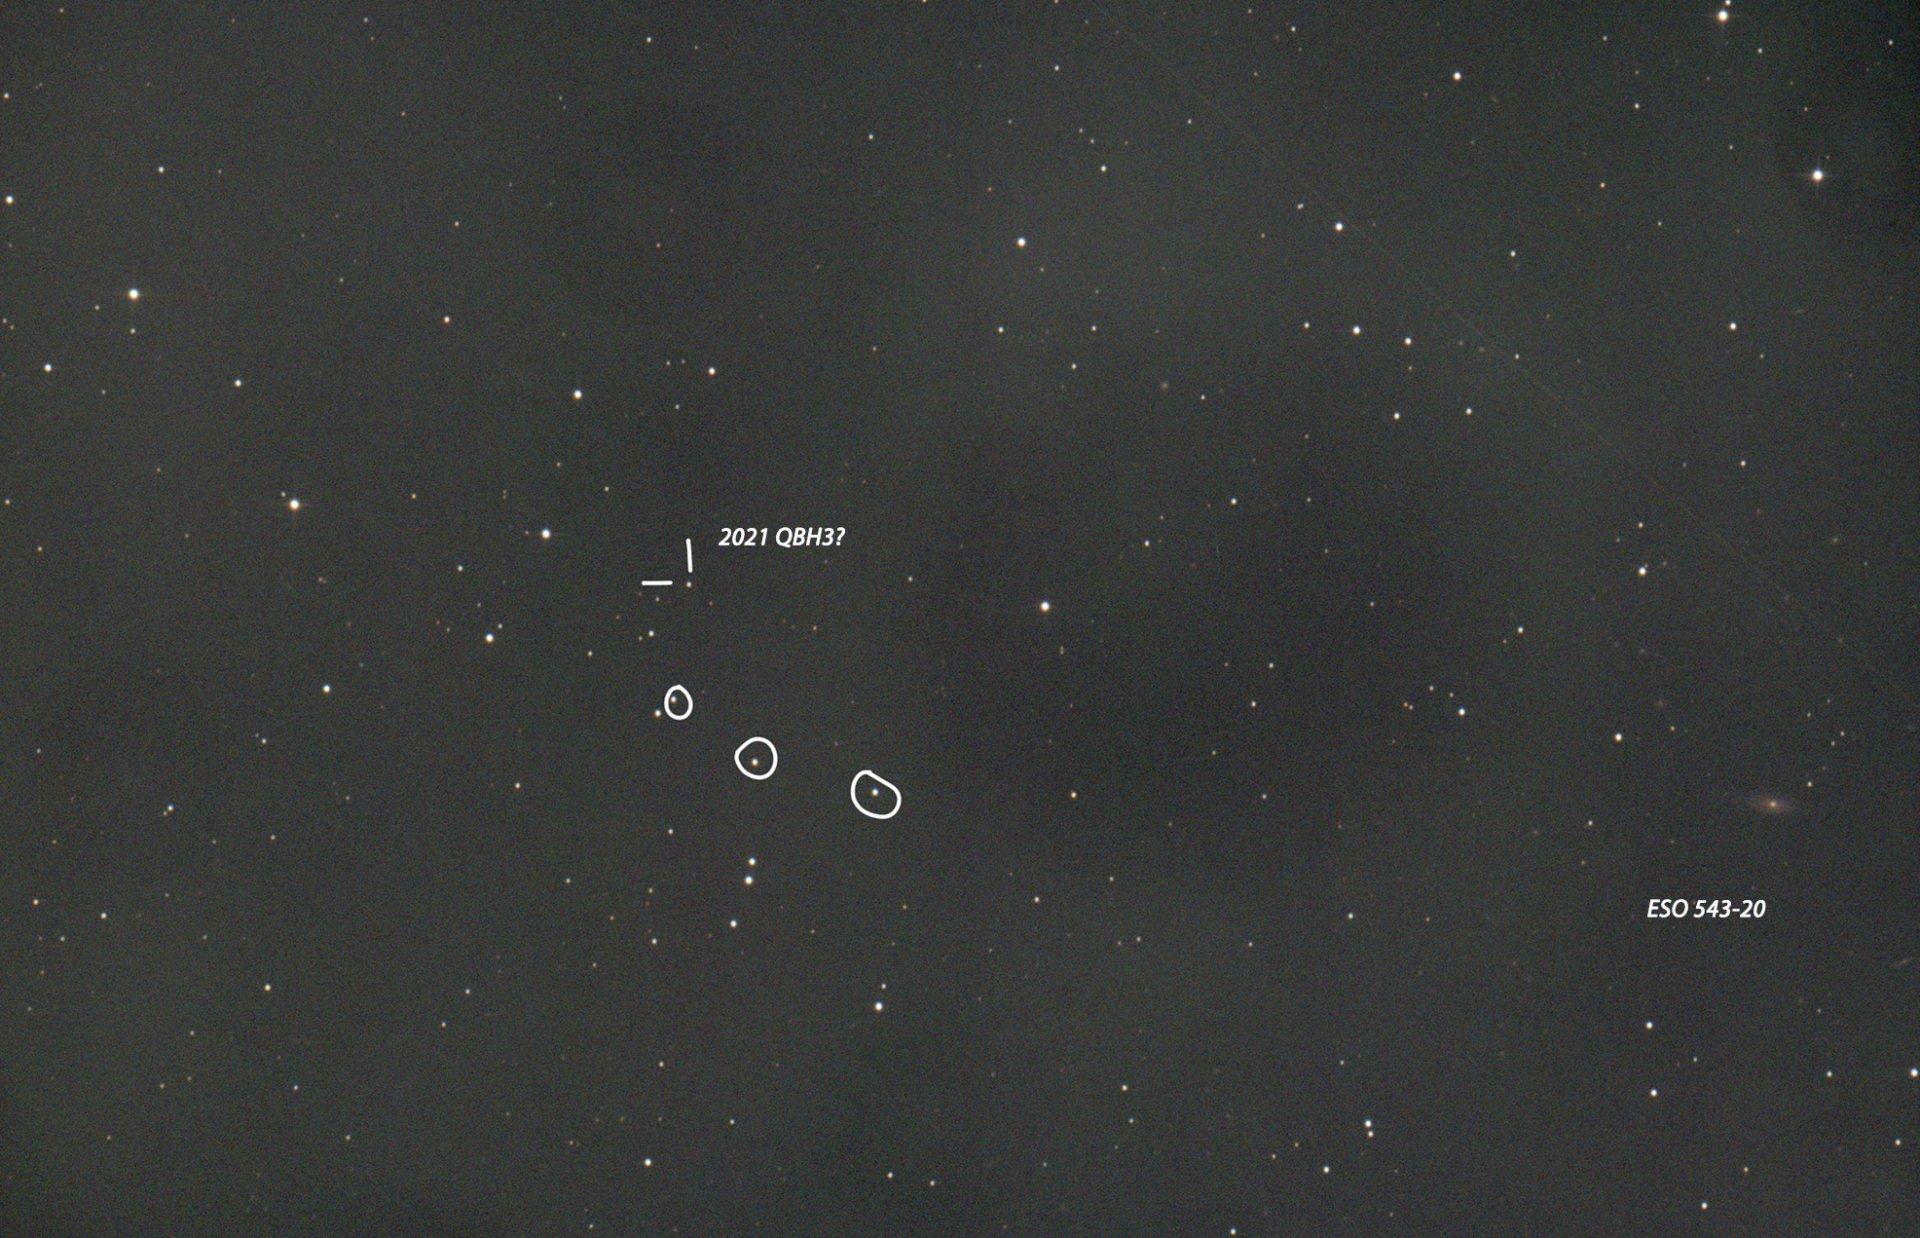 2021QBH3_9-09-21_2-00 UTC.jpg